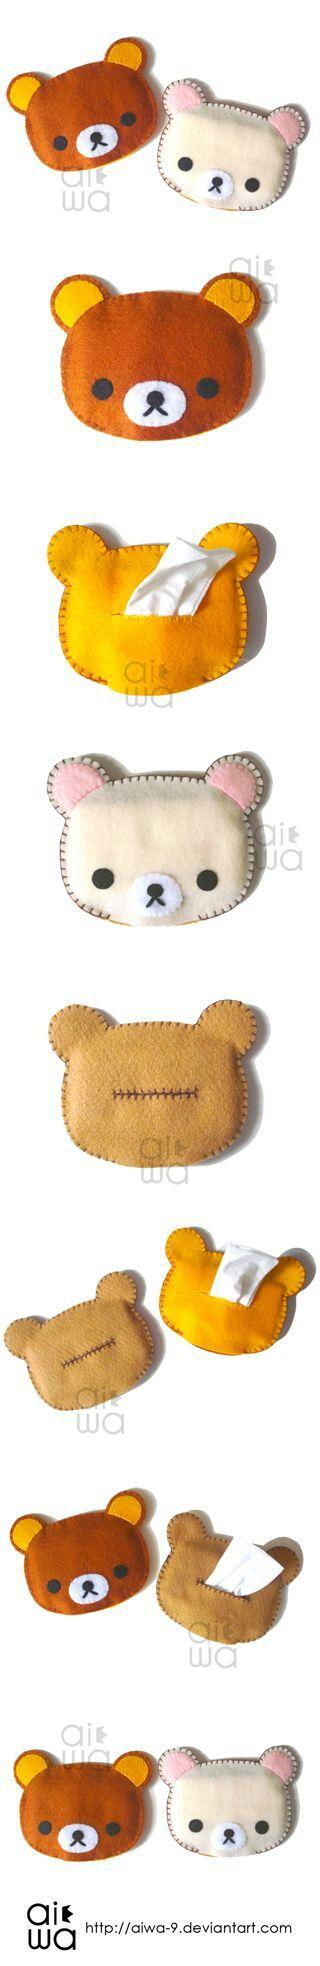 How to make a Rilkkuma tissue pouch.